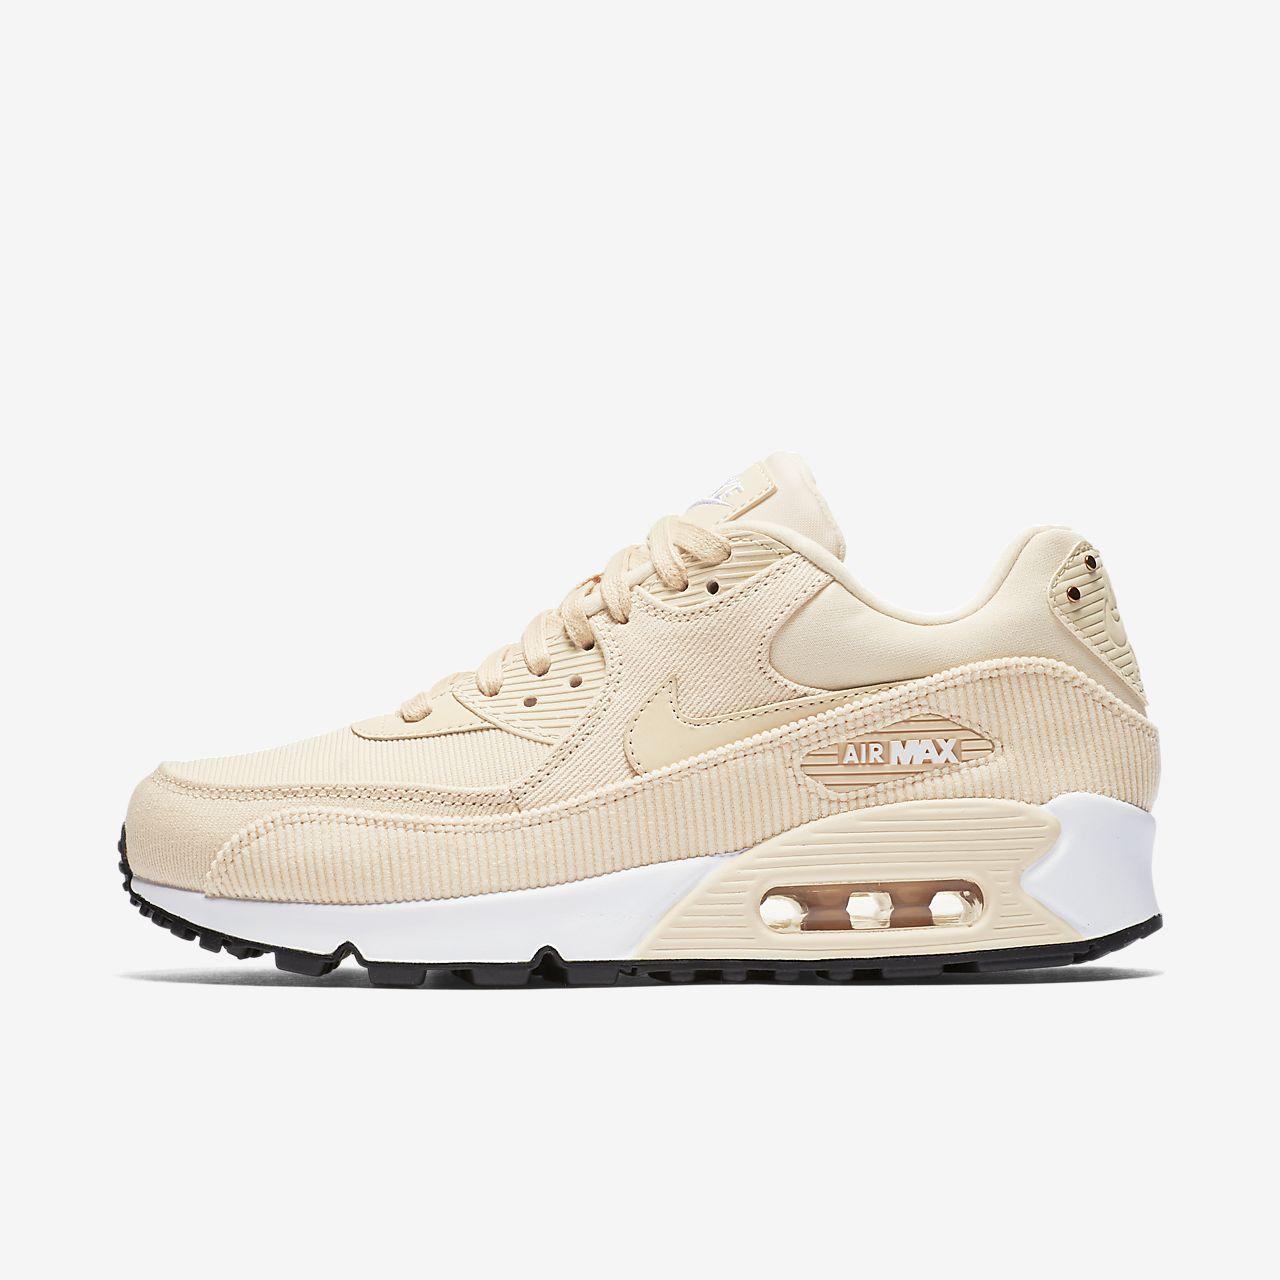 9ab1c807a22 Nike Air Max 90 Women s Shoe. Nike.com FI